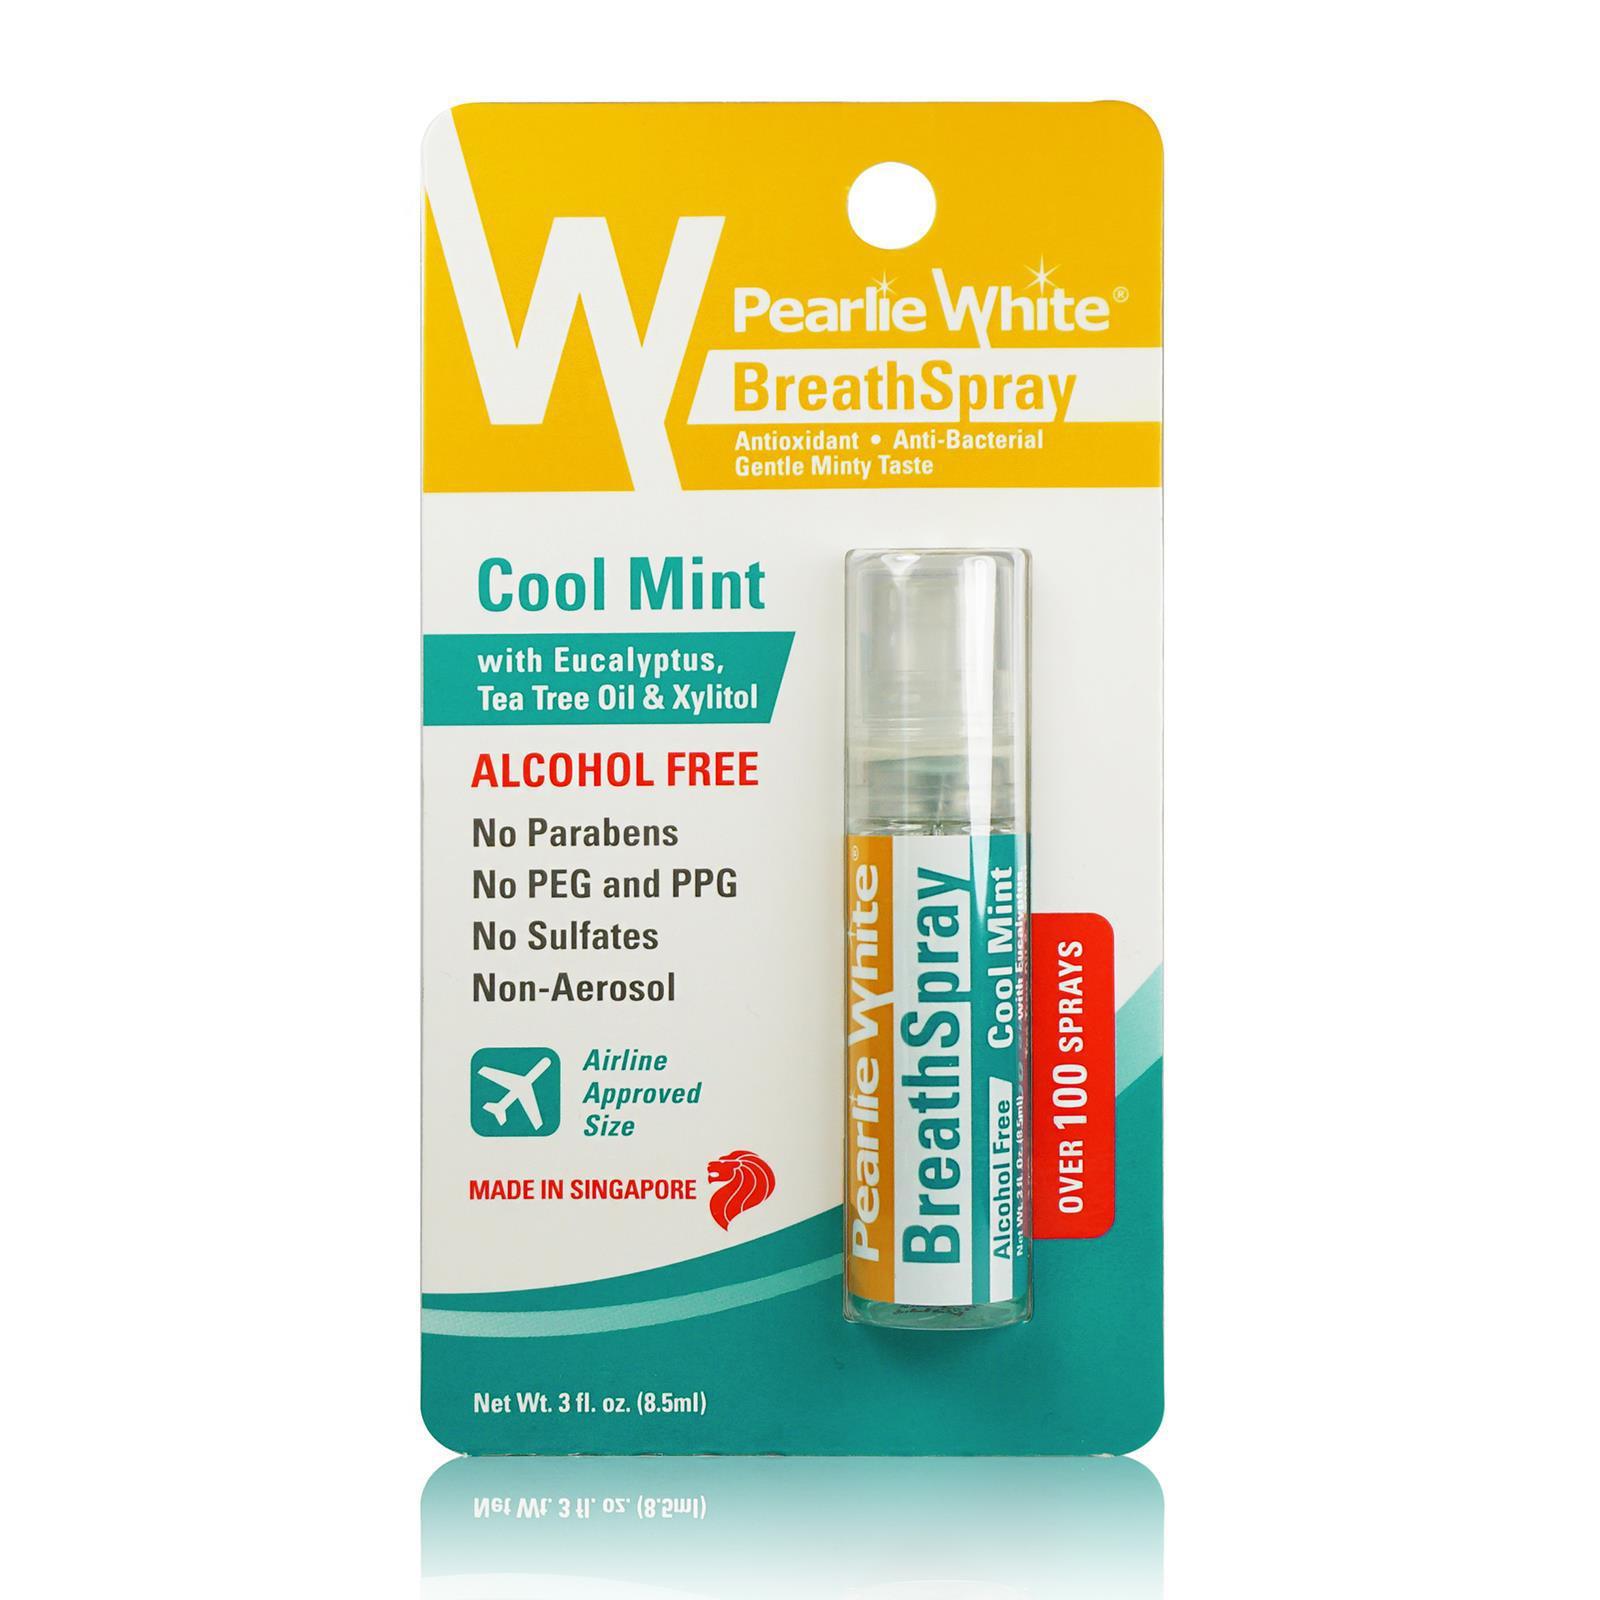 Vanestrix Hair Spa Mint Uk1 Kg Update Daftar Harga Terbaru Indonesia Prosil Green Tea 500 Pearlie White Breath Spray Alcohol Free Cool 100 Sprays